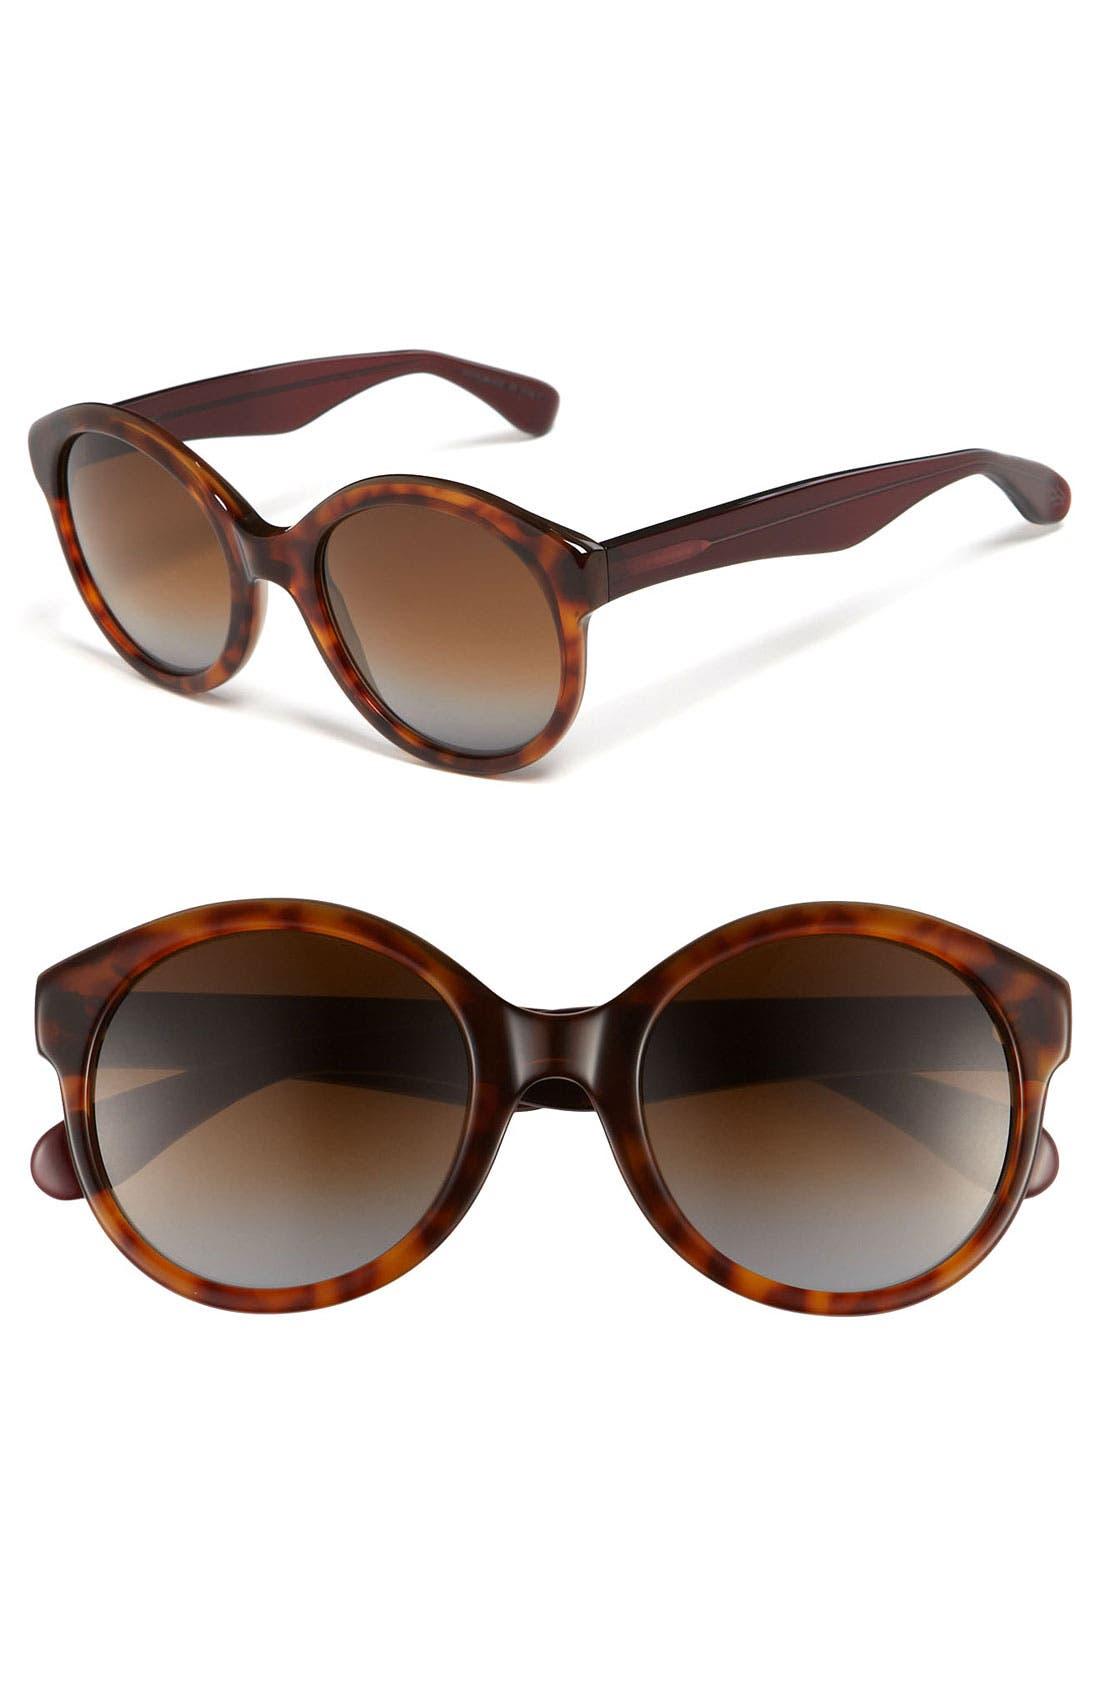 Small Round Sunglasses,                             Main thumbnail 1, color,                             200